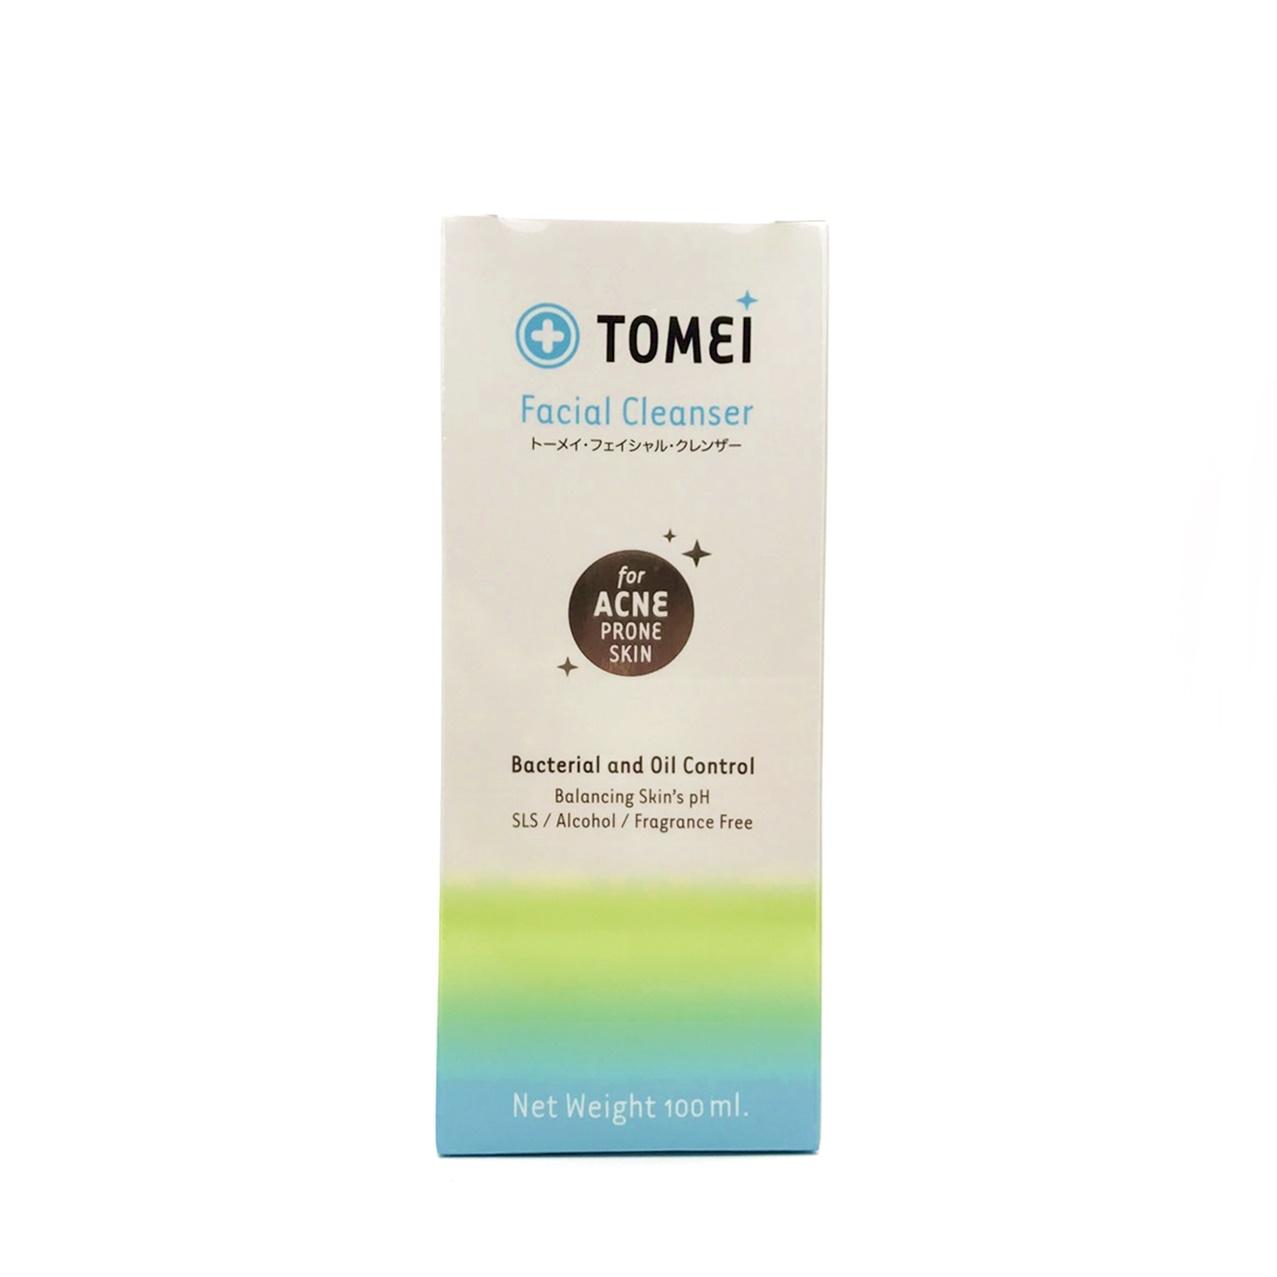 Tomei Facial Cleanser 100ml โทเมอิ เฟเชียล คลีนเซอร์